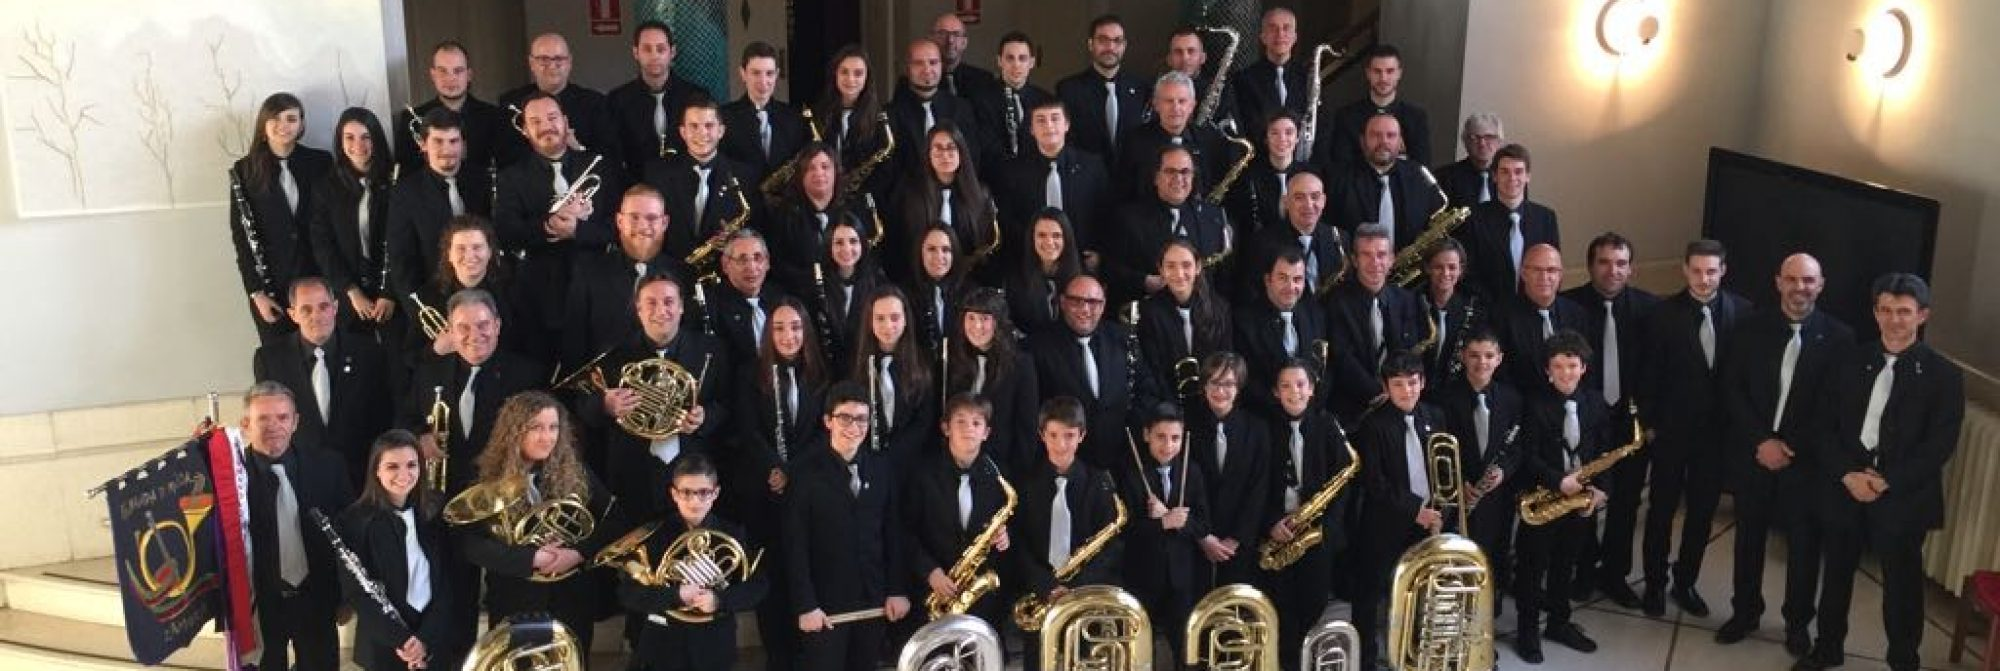 Banda de Música Maestro Nacor Blanco